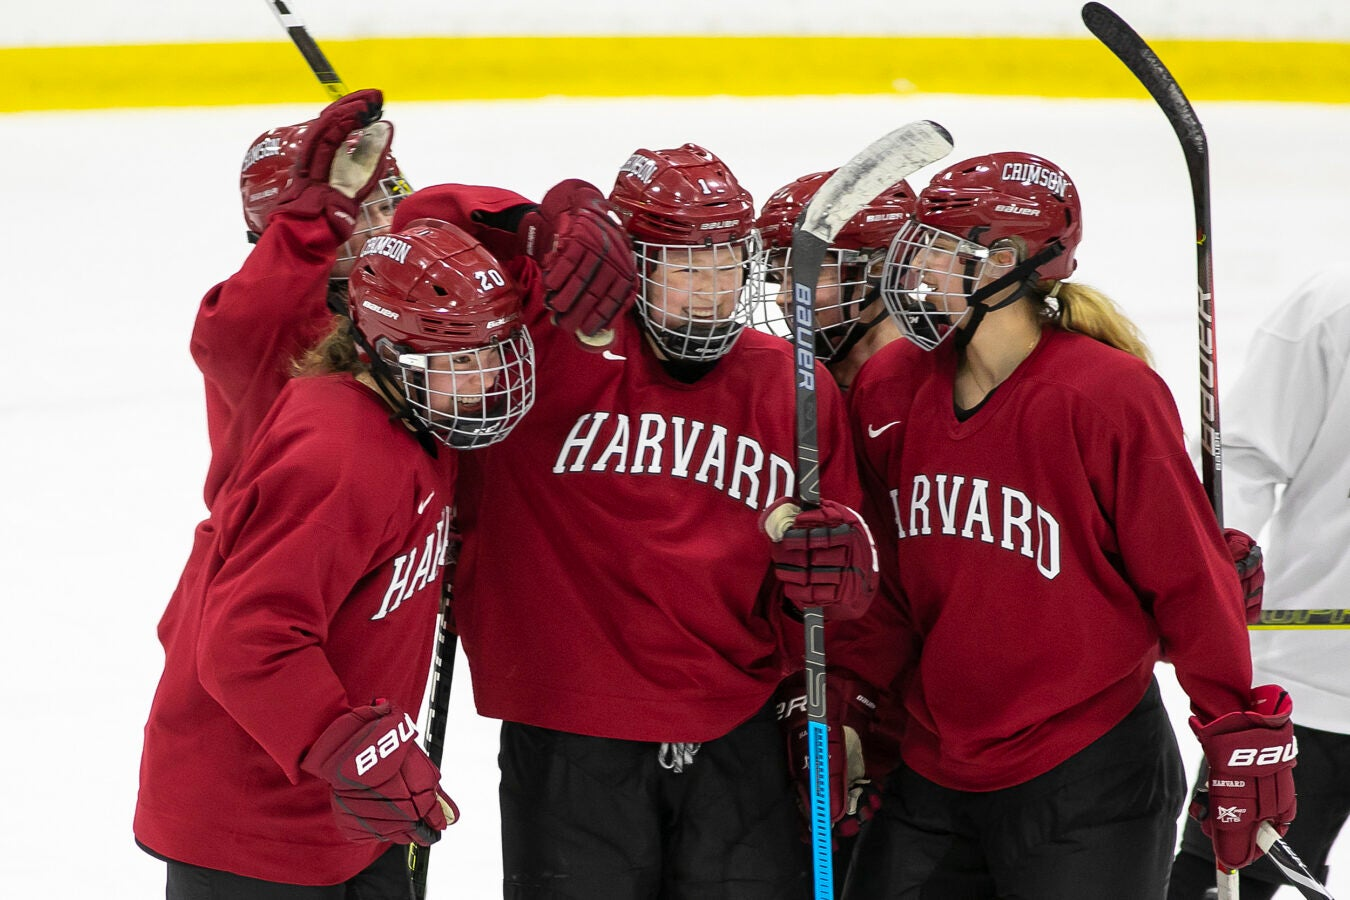 Harvard's Women's Ice Hockey team practices.